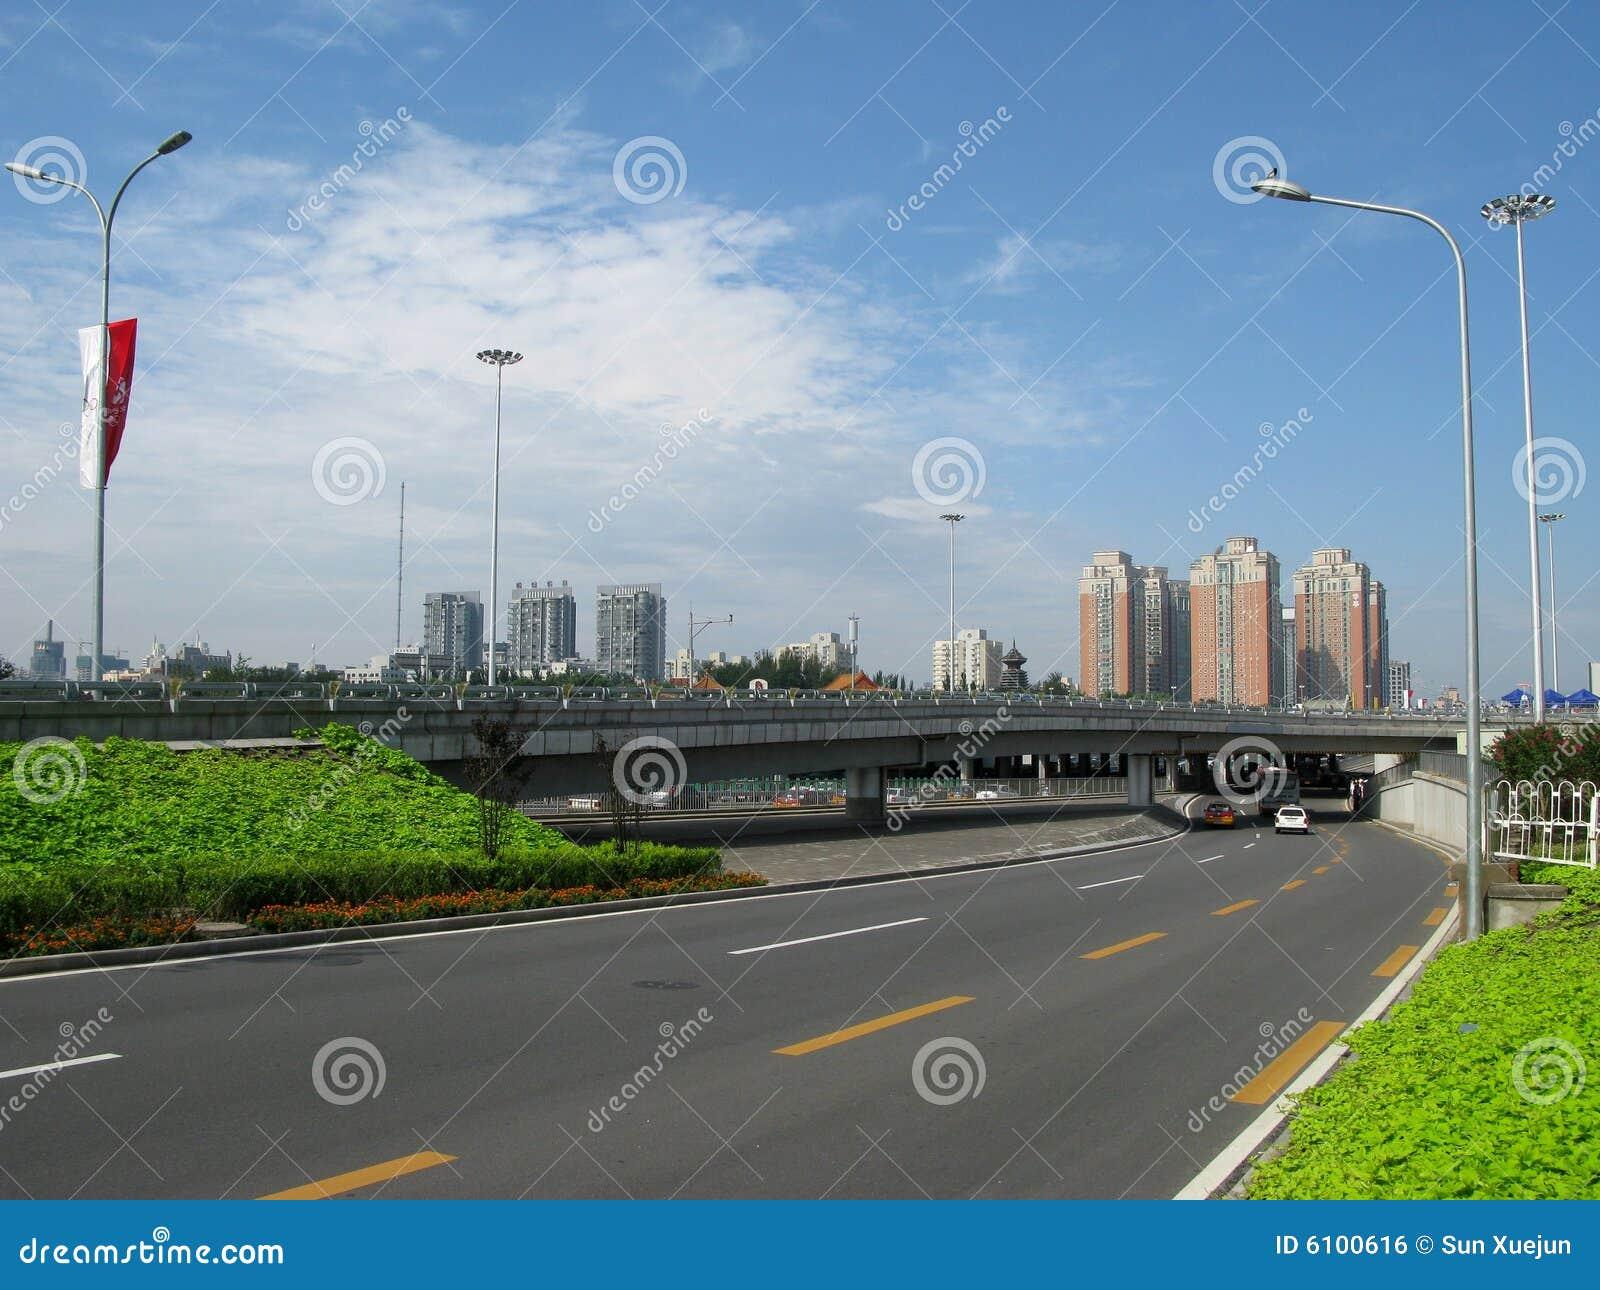 Transportation of modern city,Beijing